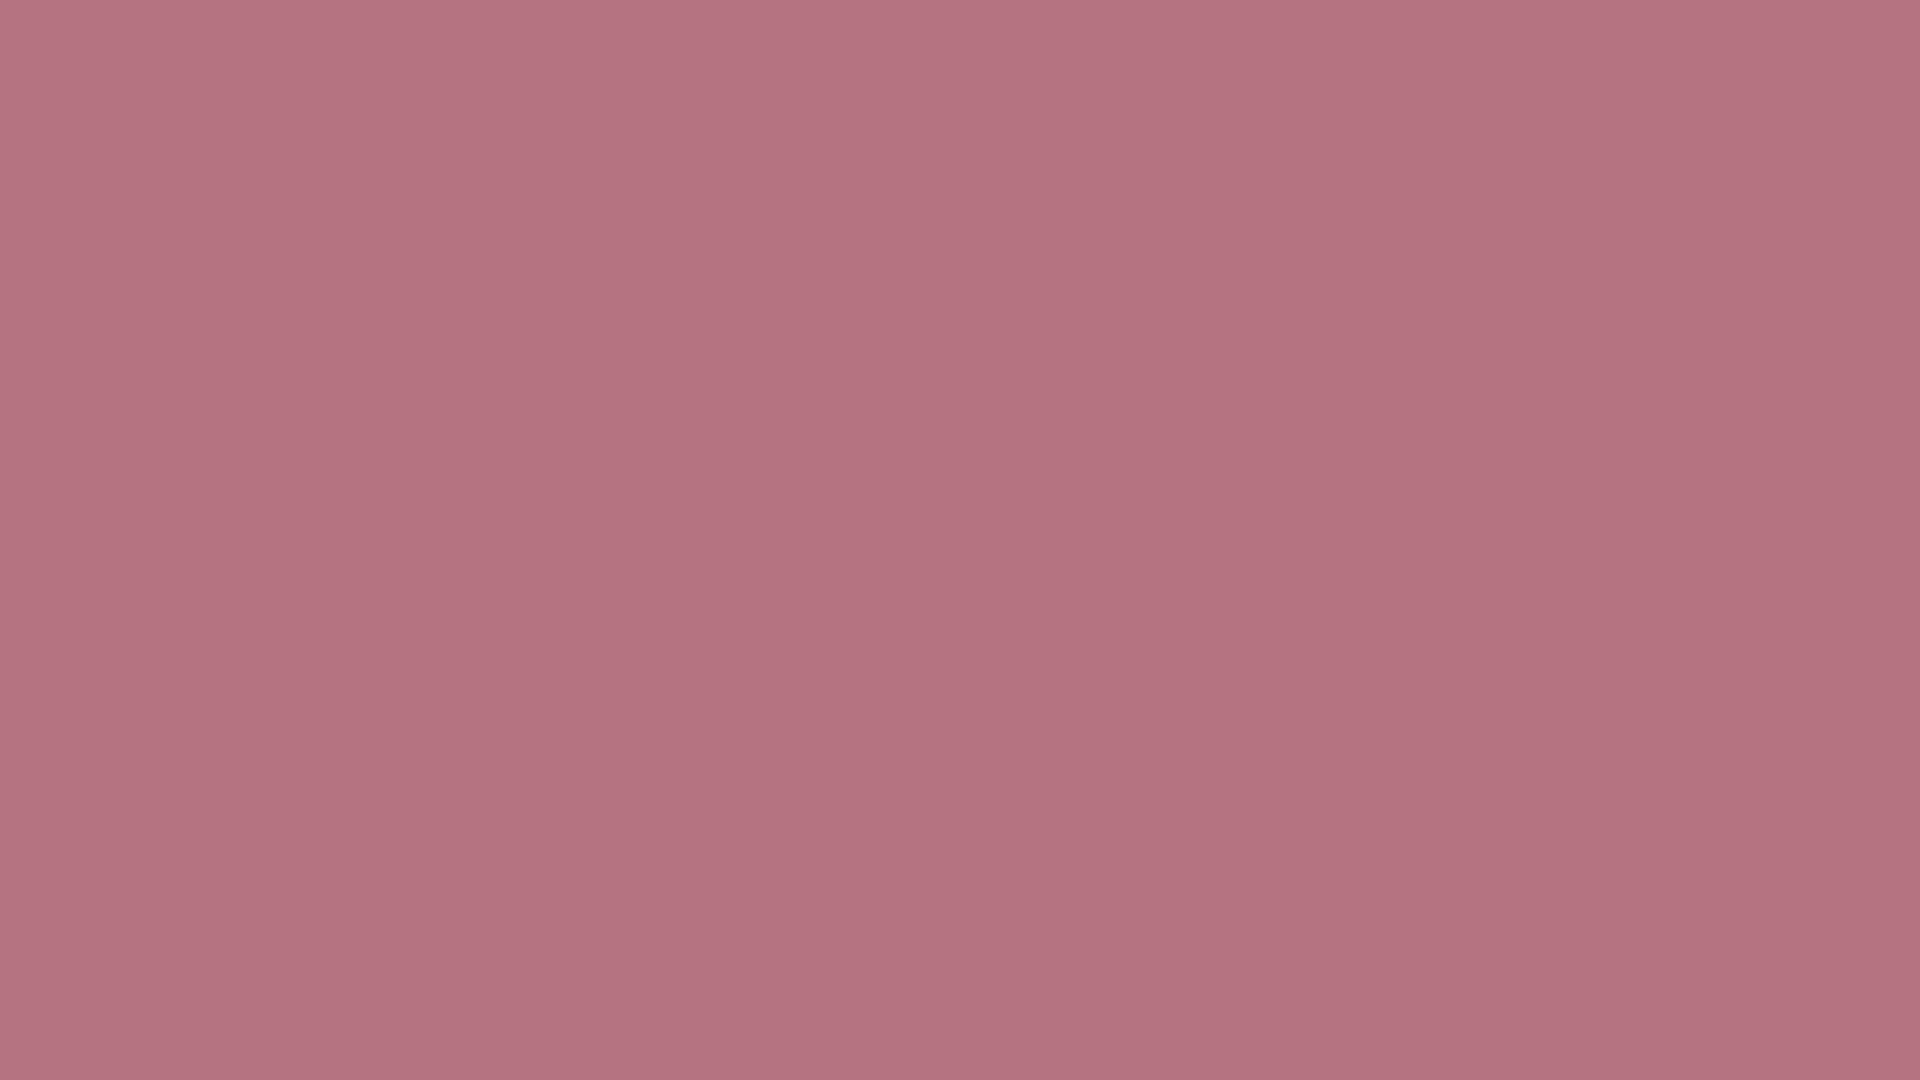 1920x1080 Turkish Rose Solid Color Background